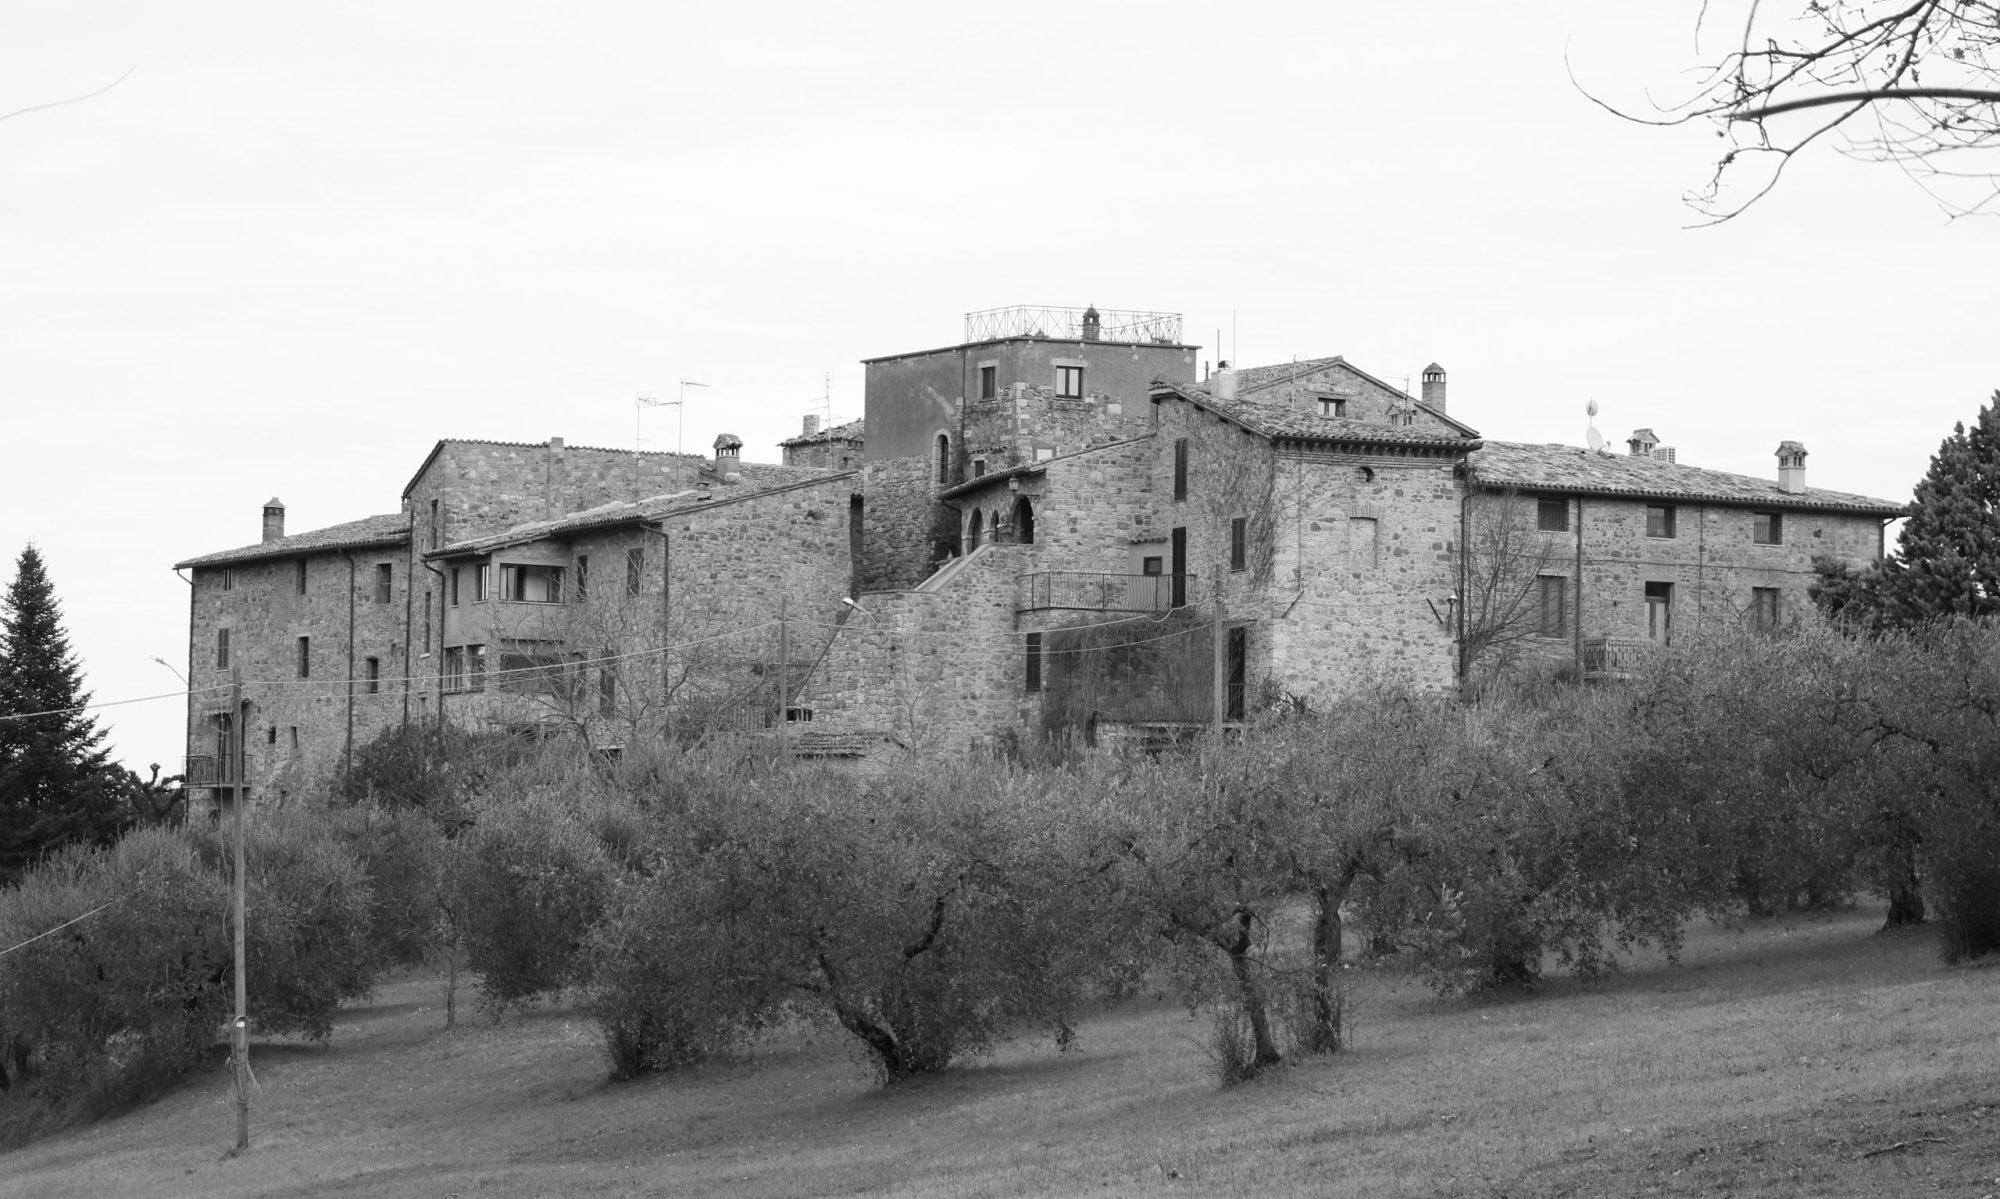 Casa Zefferino